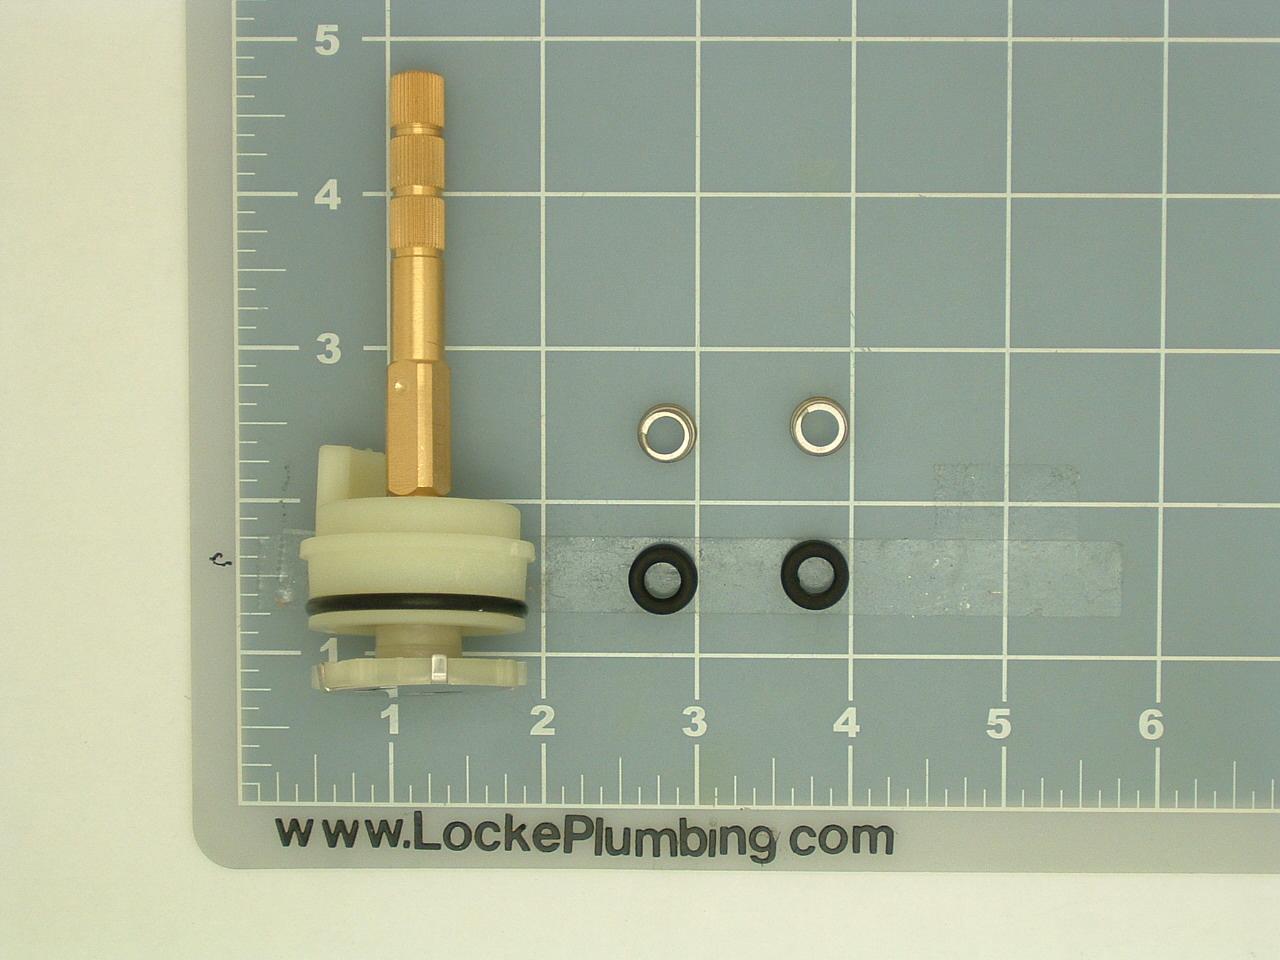 Danze Shower Cartridge Replacement Sweet Puff Glass Pipe